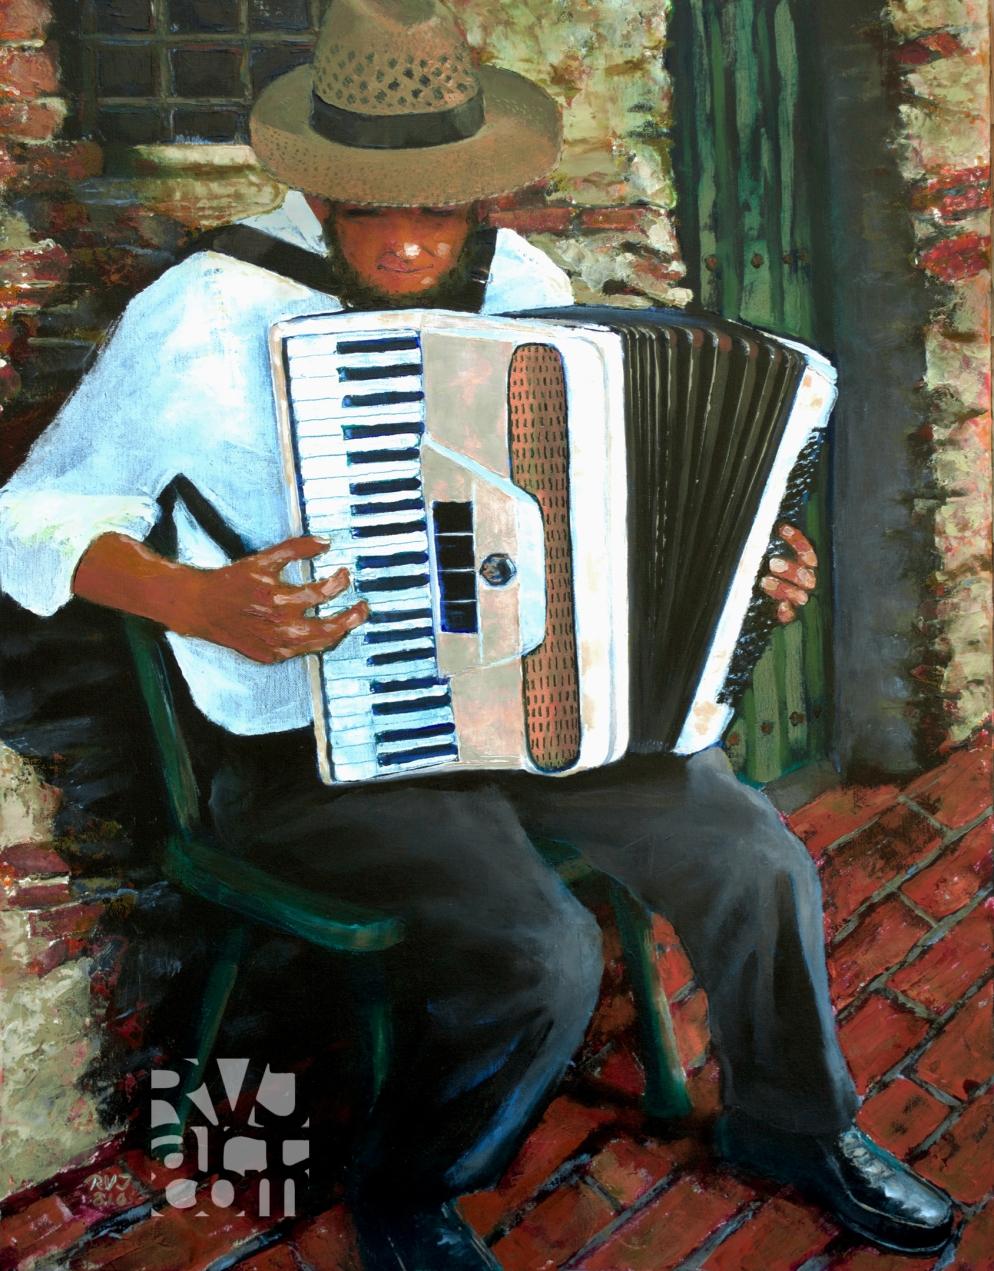 Chromatic Accordionist, España, oil painting by Roger Vincent Jasaitis, Copyright 2016, RVJart.com